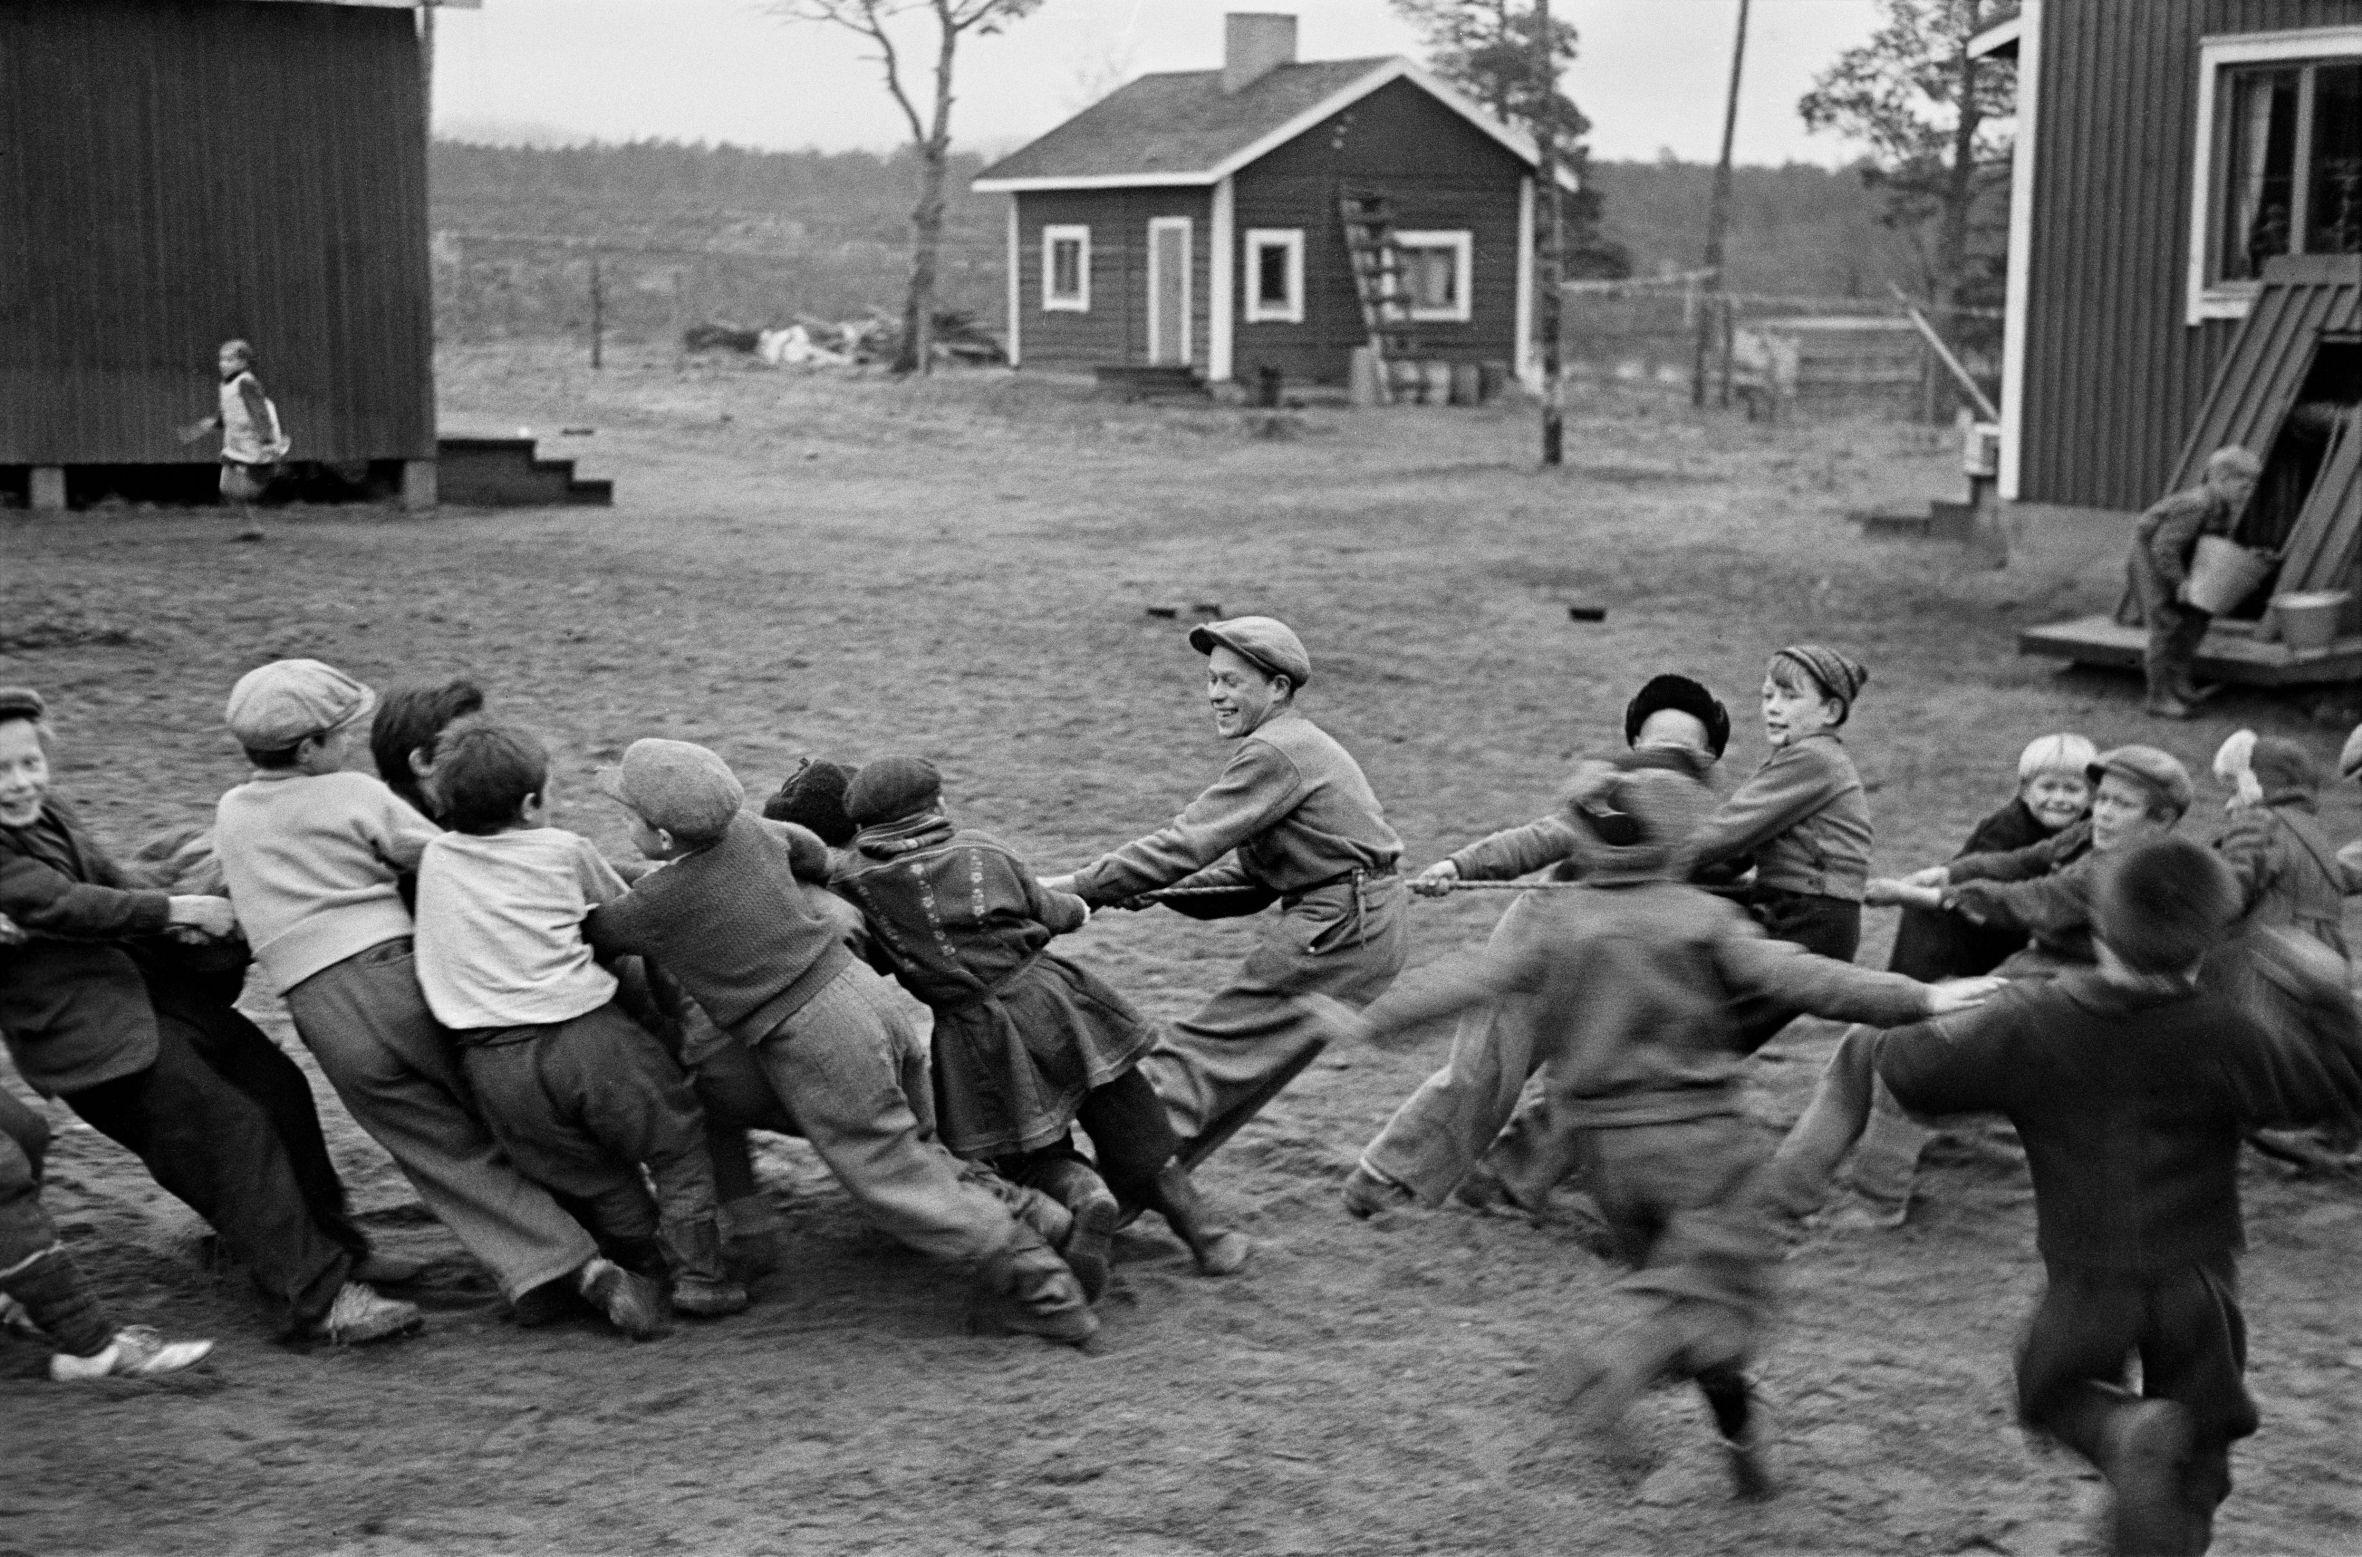 Finland. Naarva. 1948 © Werner Bischof _ Magnum Photos2019